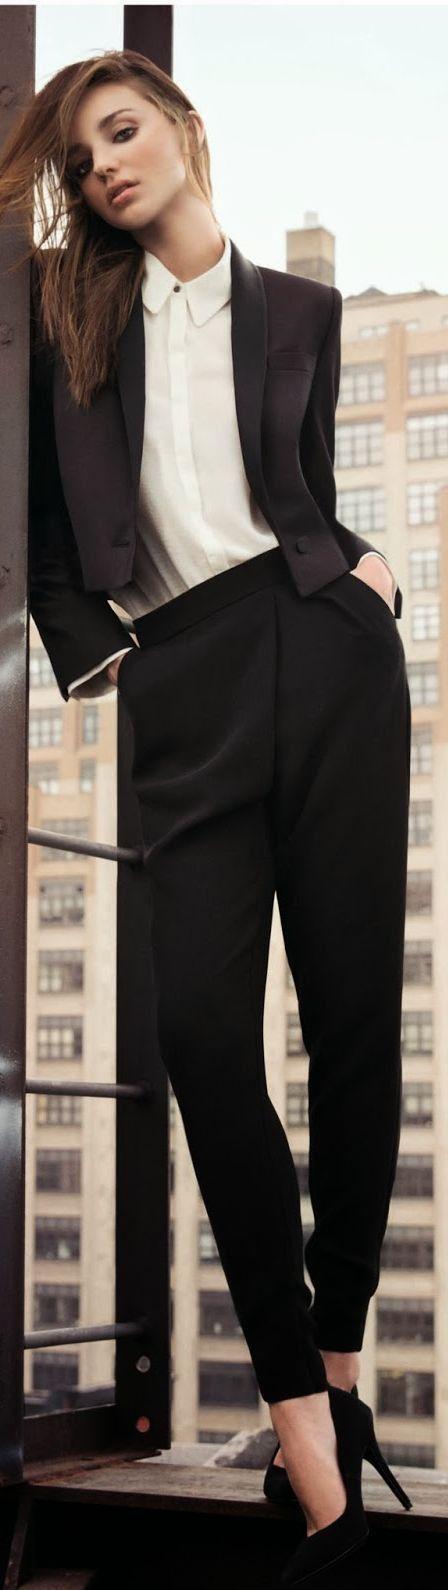 Women's suit. Miranda Kerr. #womens #fashion #suit #office #clothing